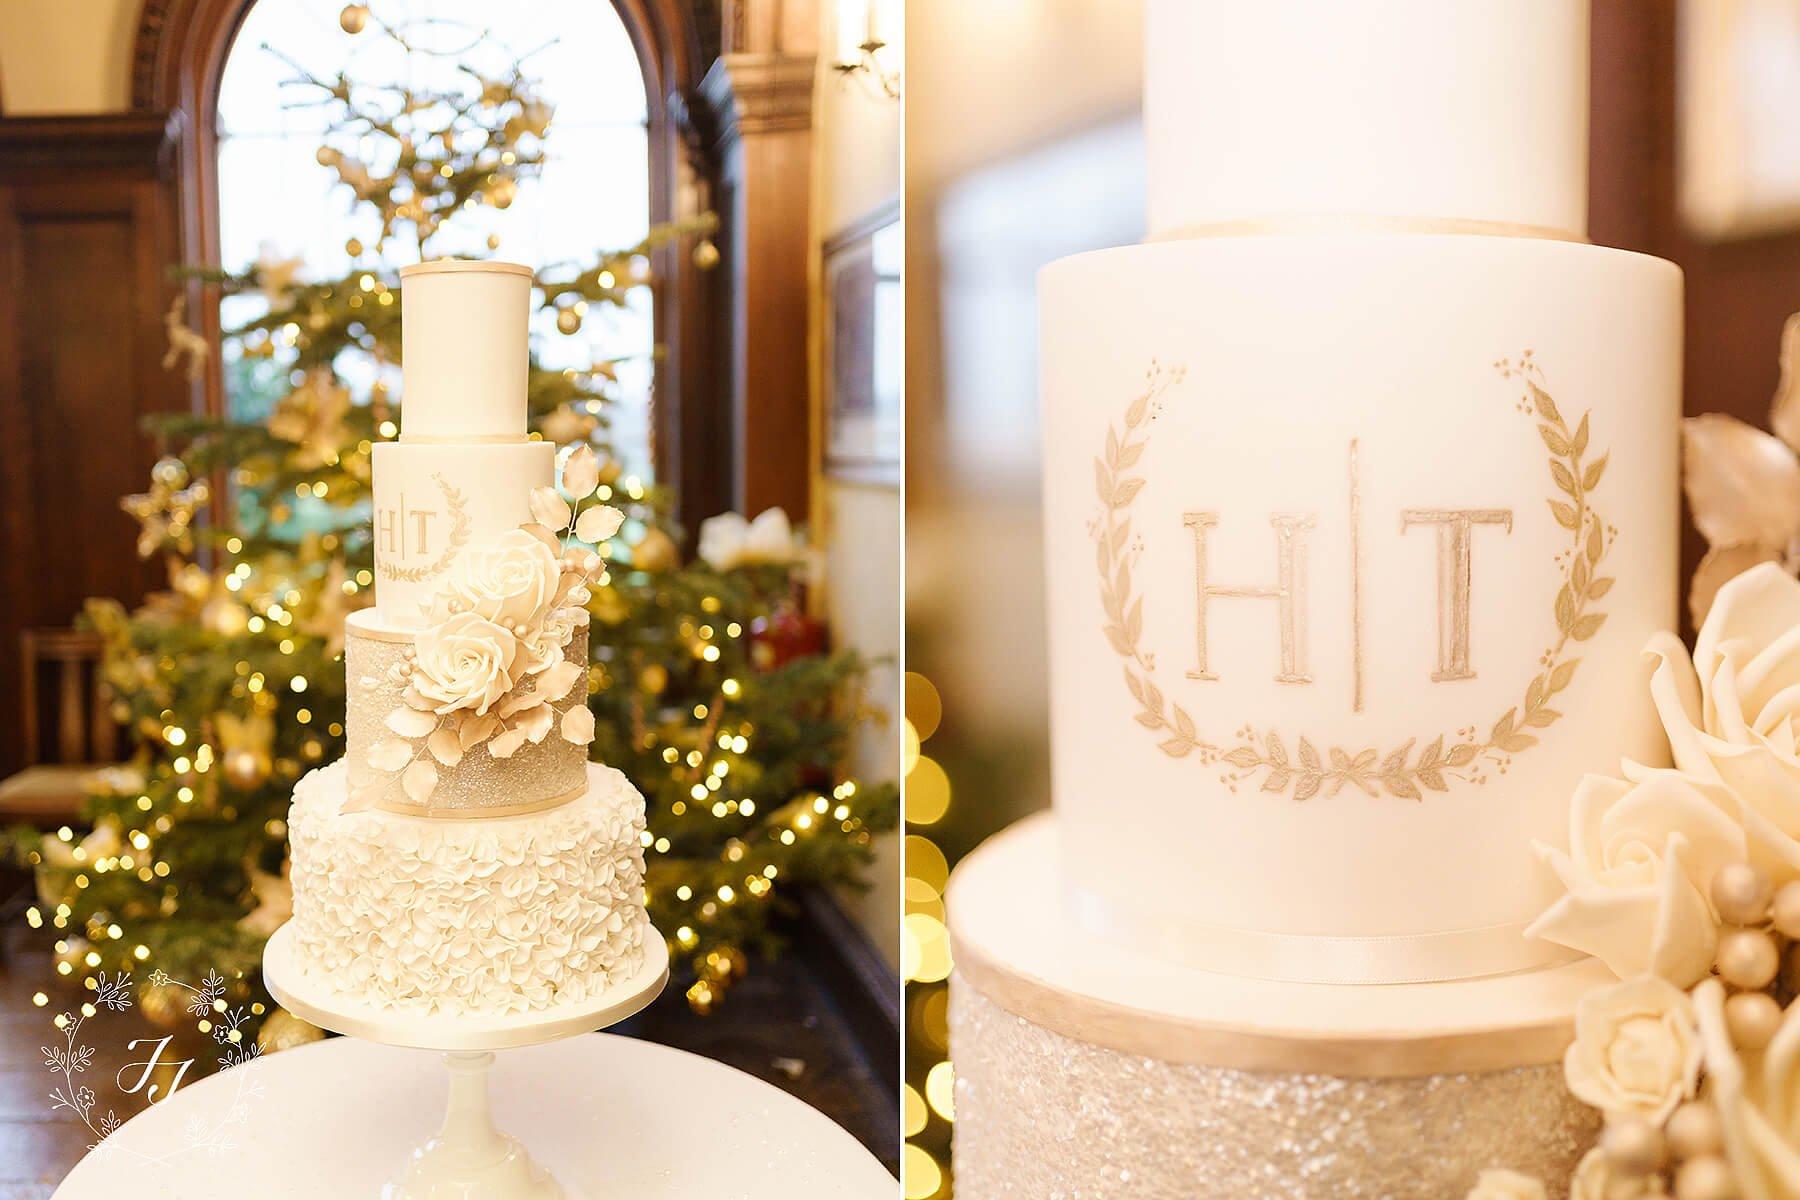 wedding cake with Christmas tree behind